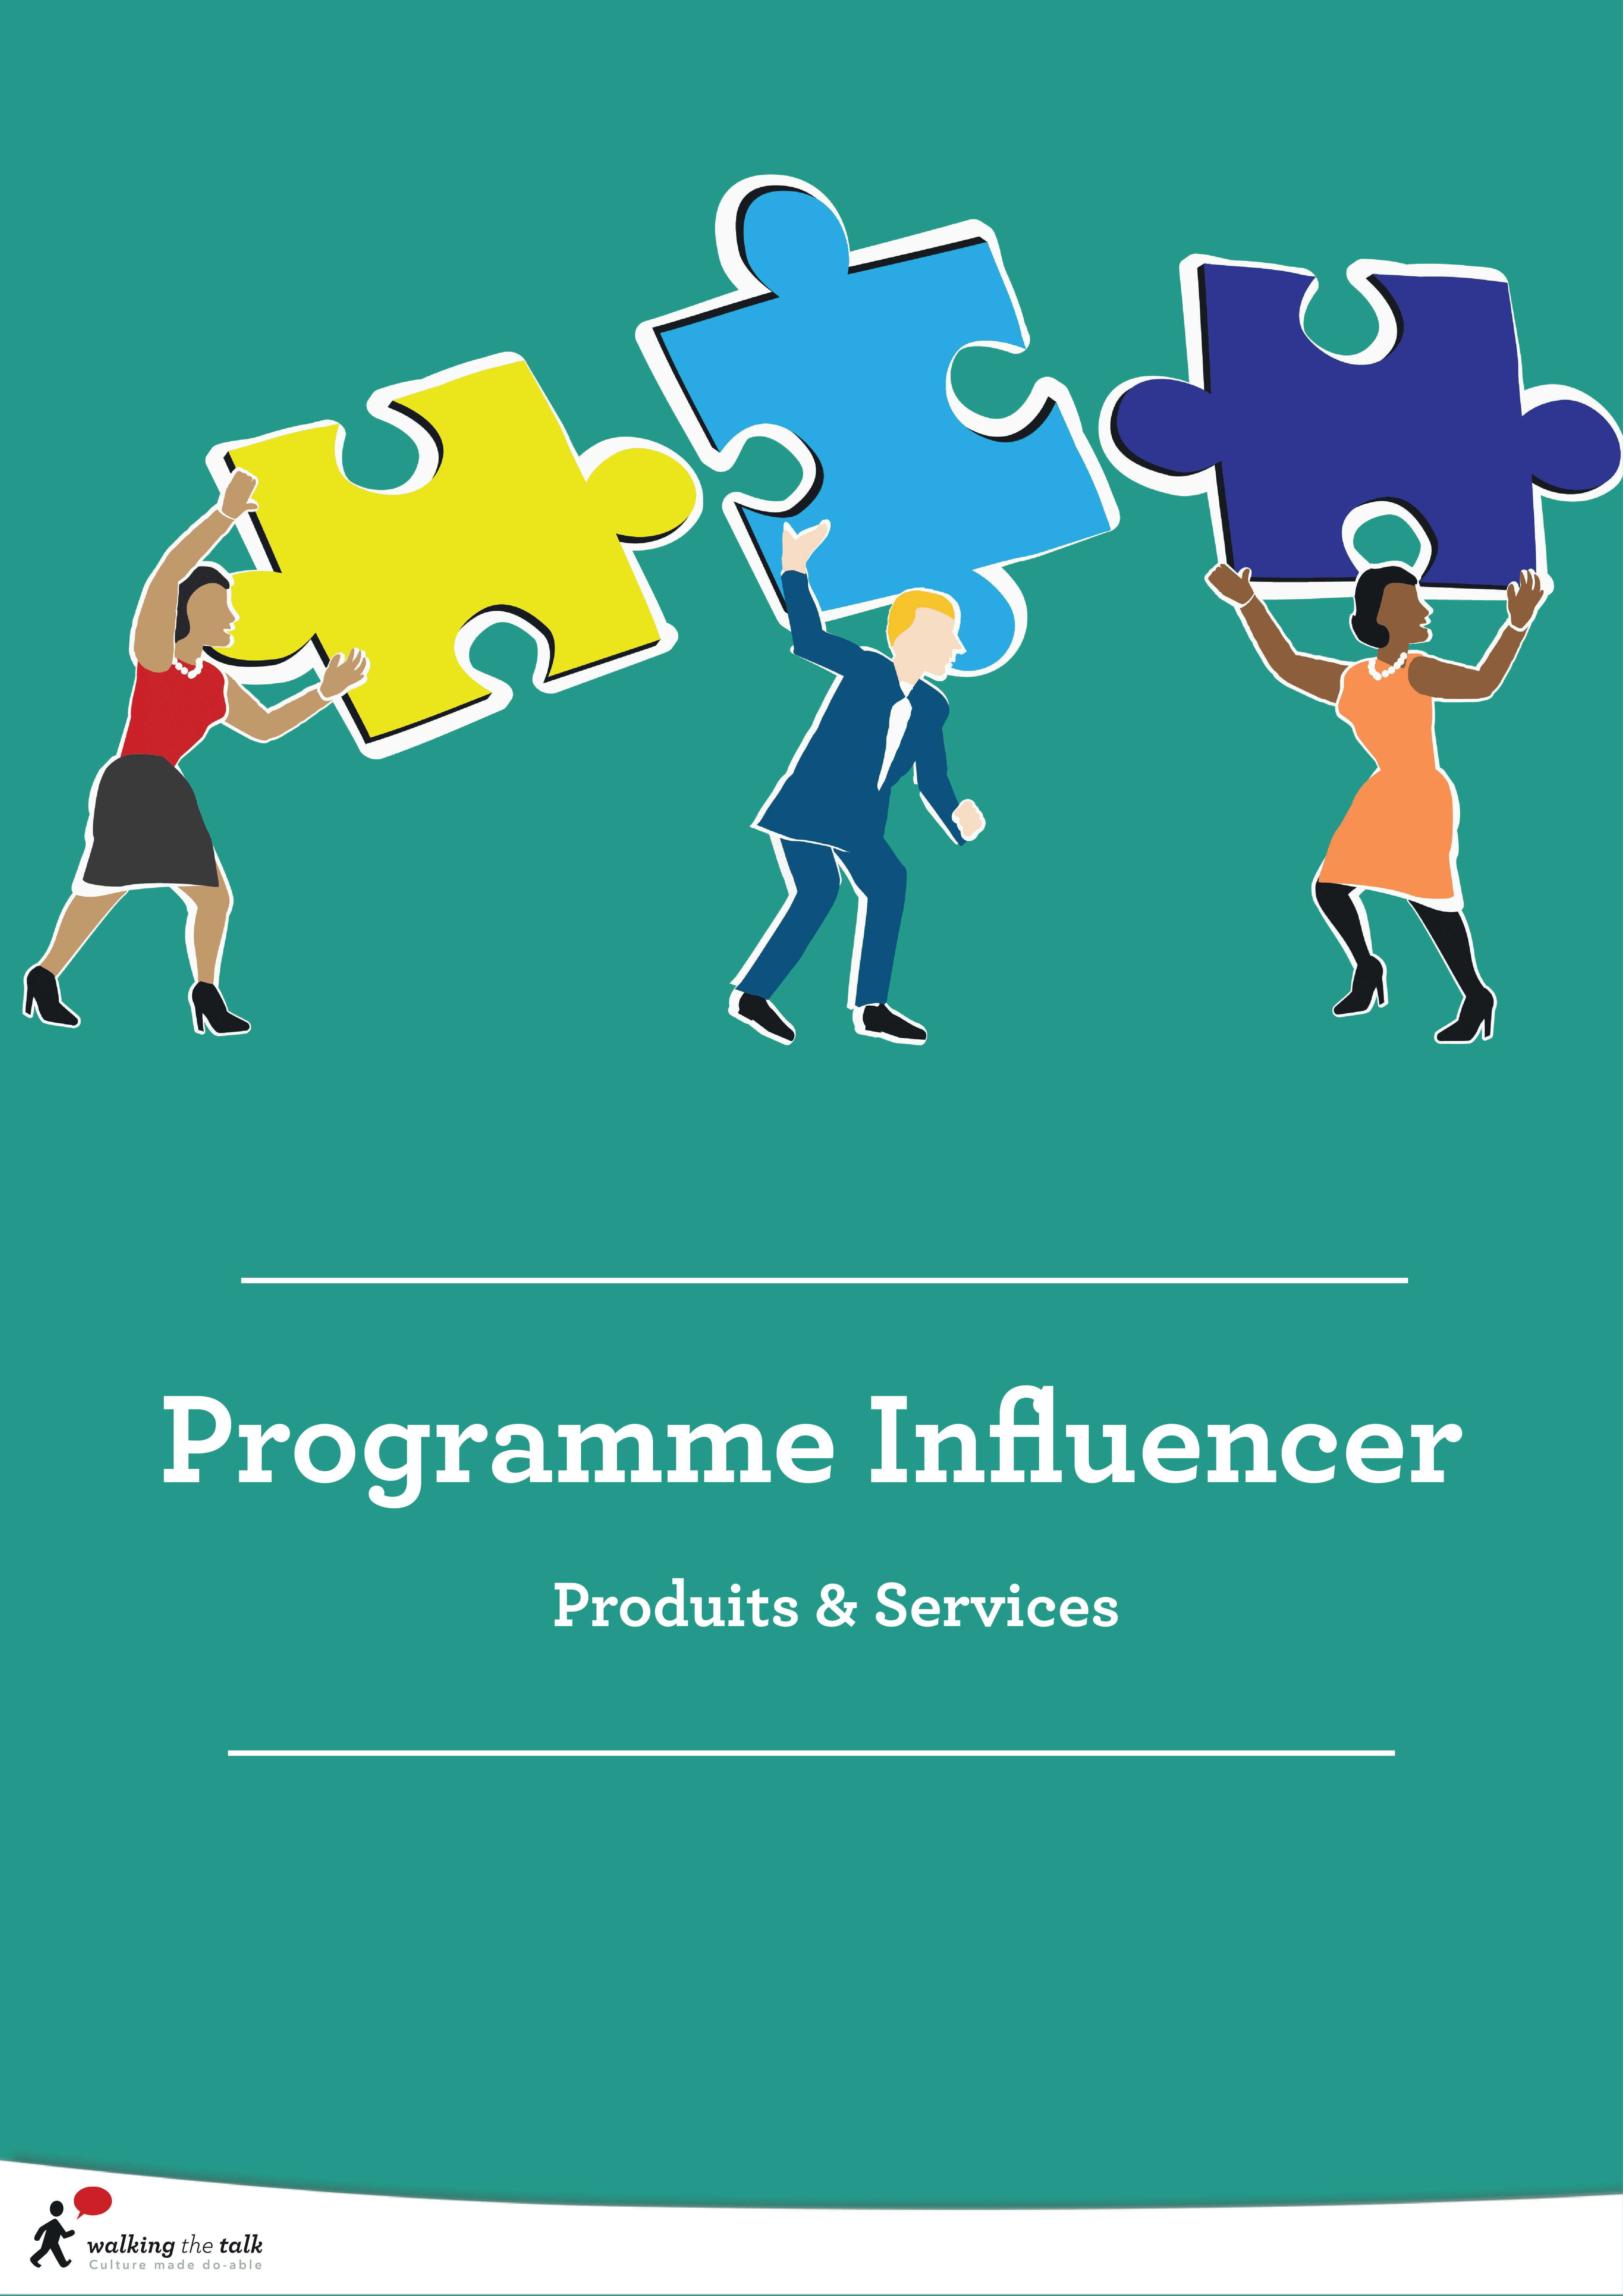 Notre programme Influencer